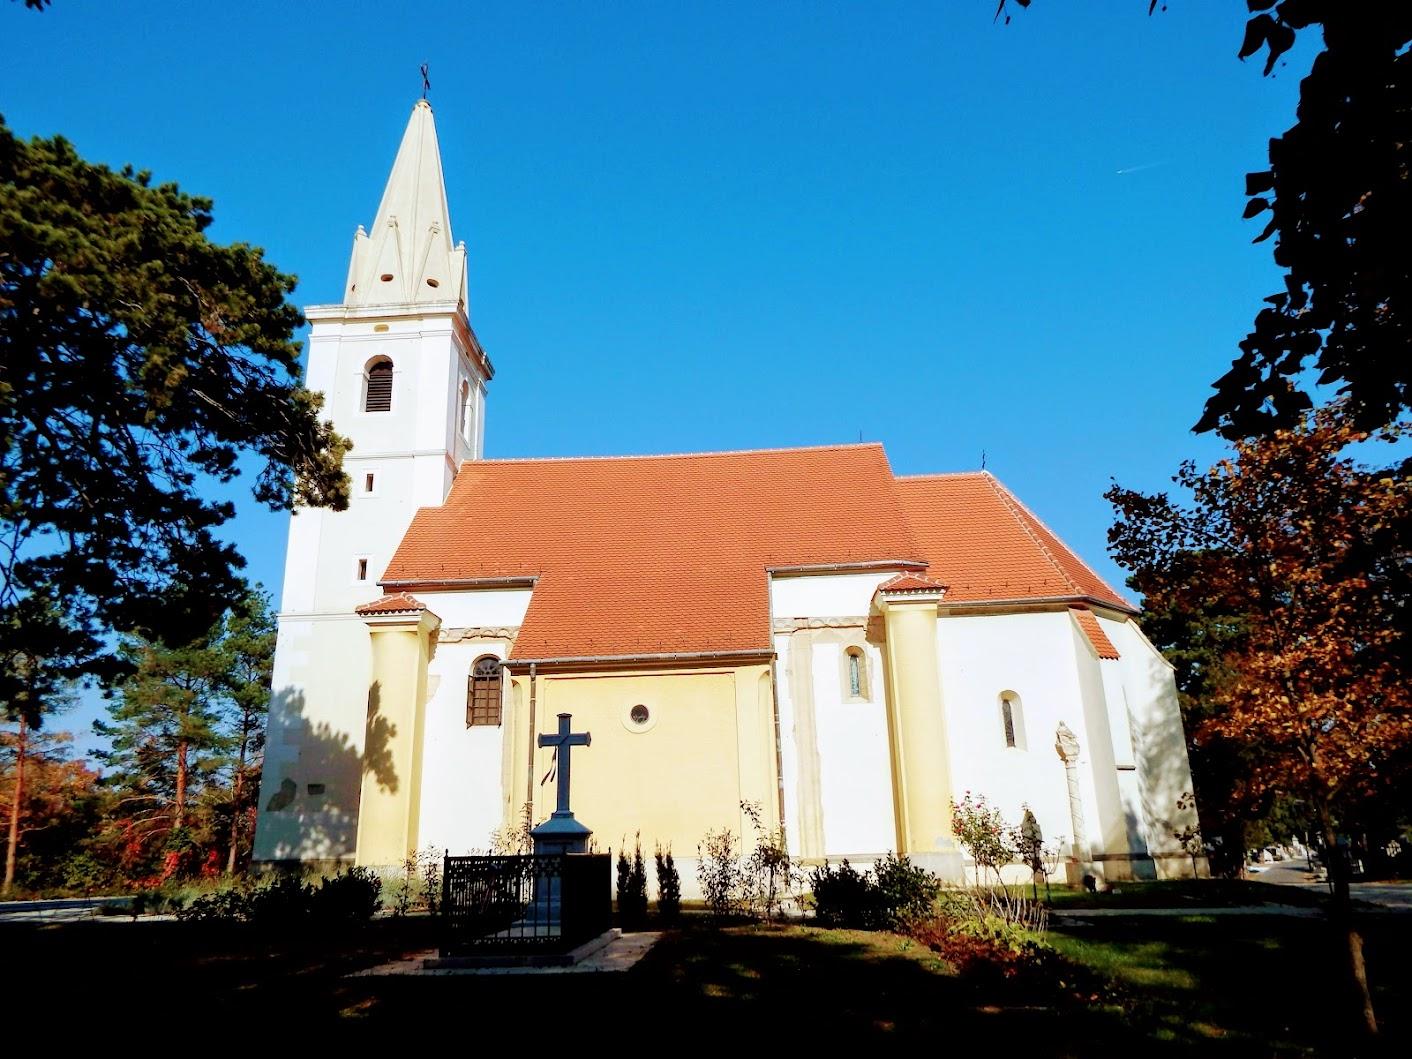 Bük - Szent Imre herceg rk. templom